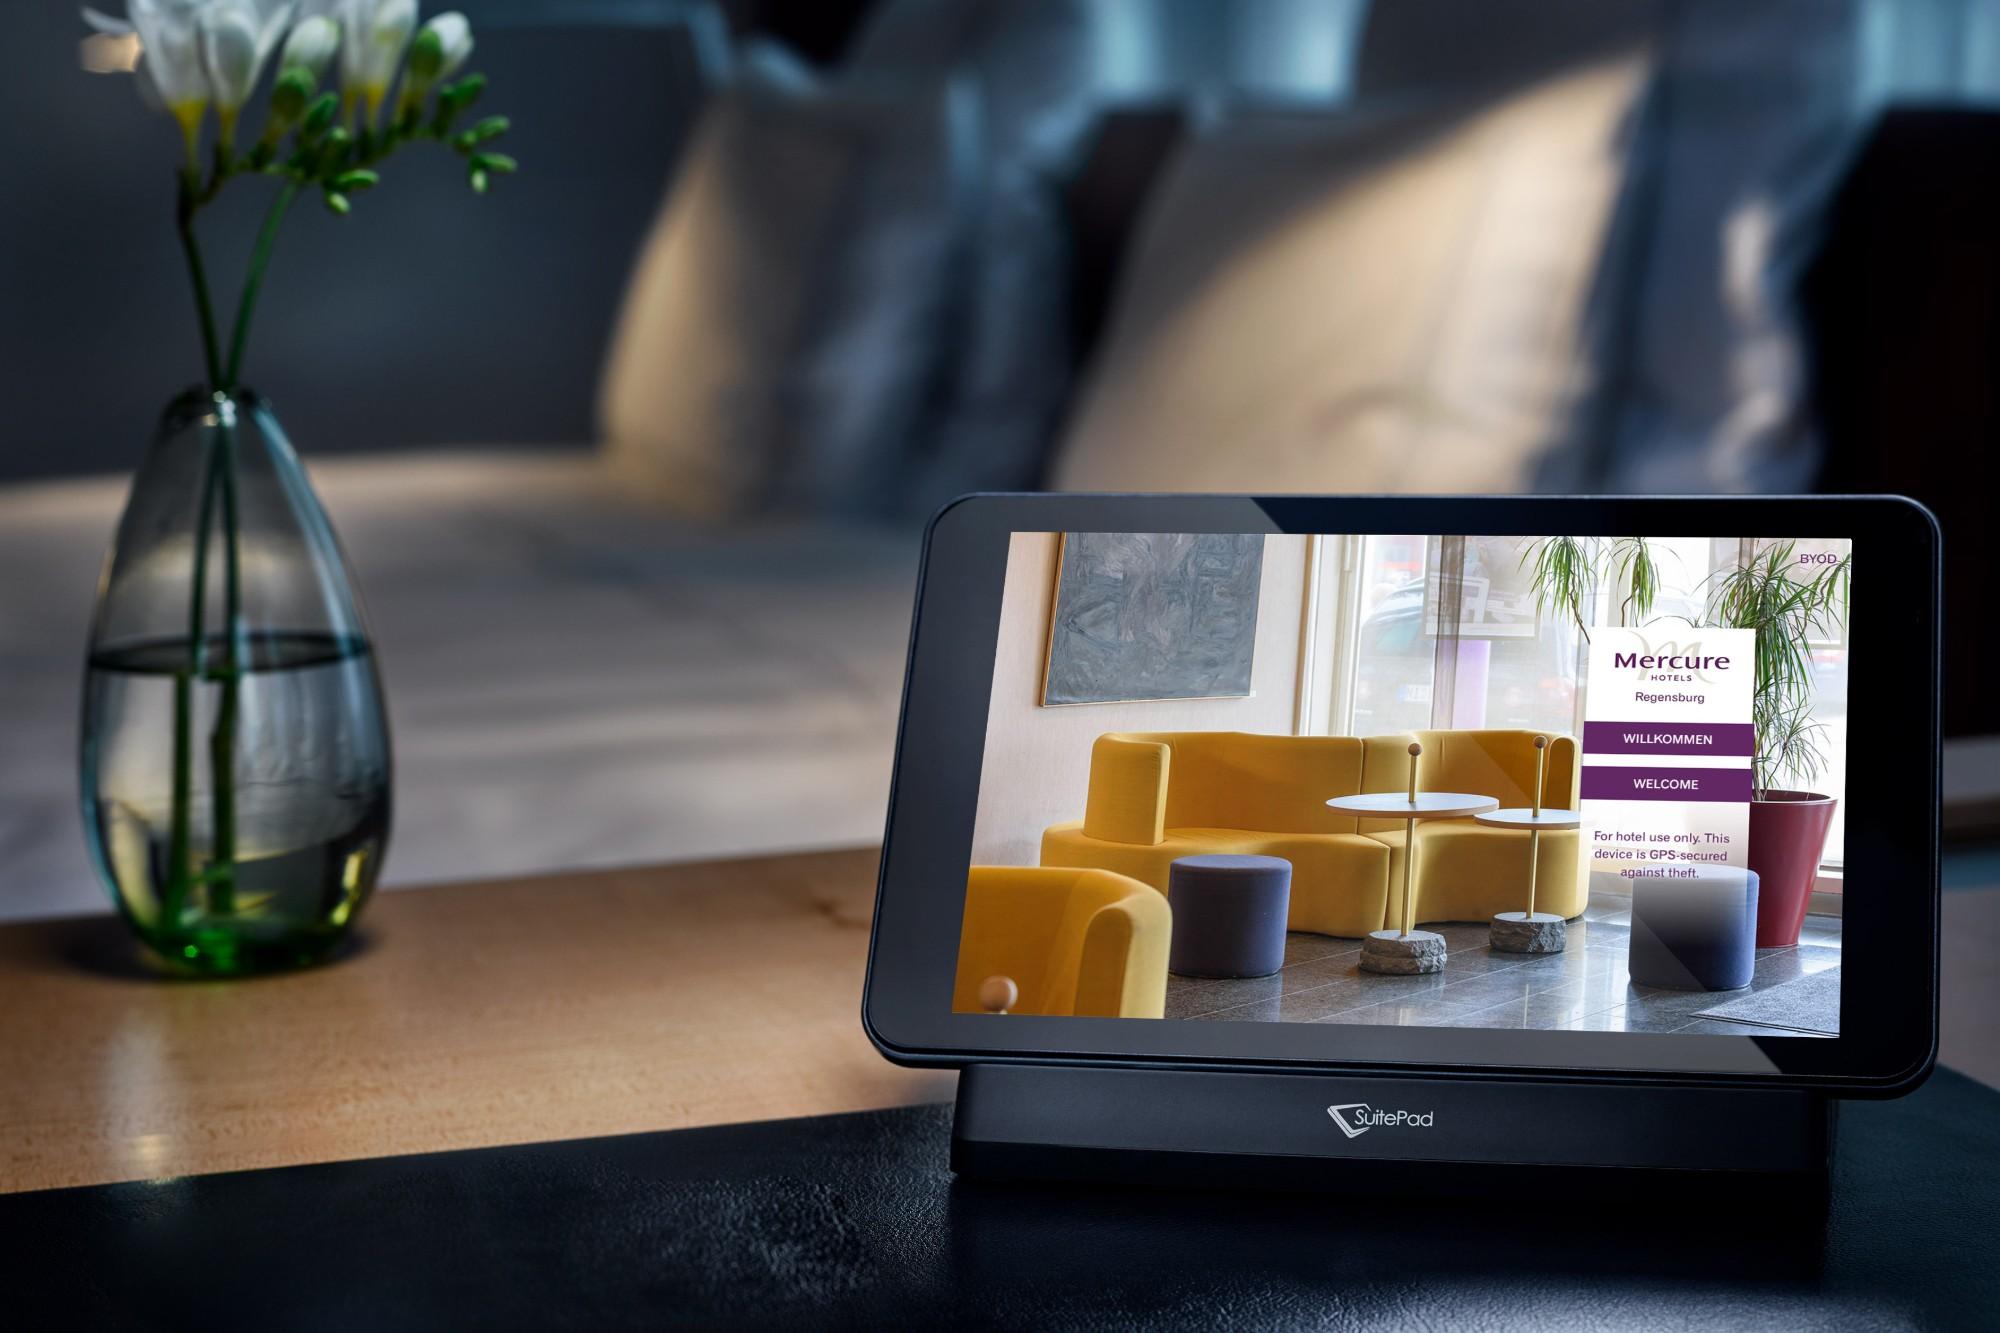 Digitale Gästekommunikation im Hotelzimmer mit SuitePad Tablet